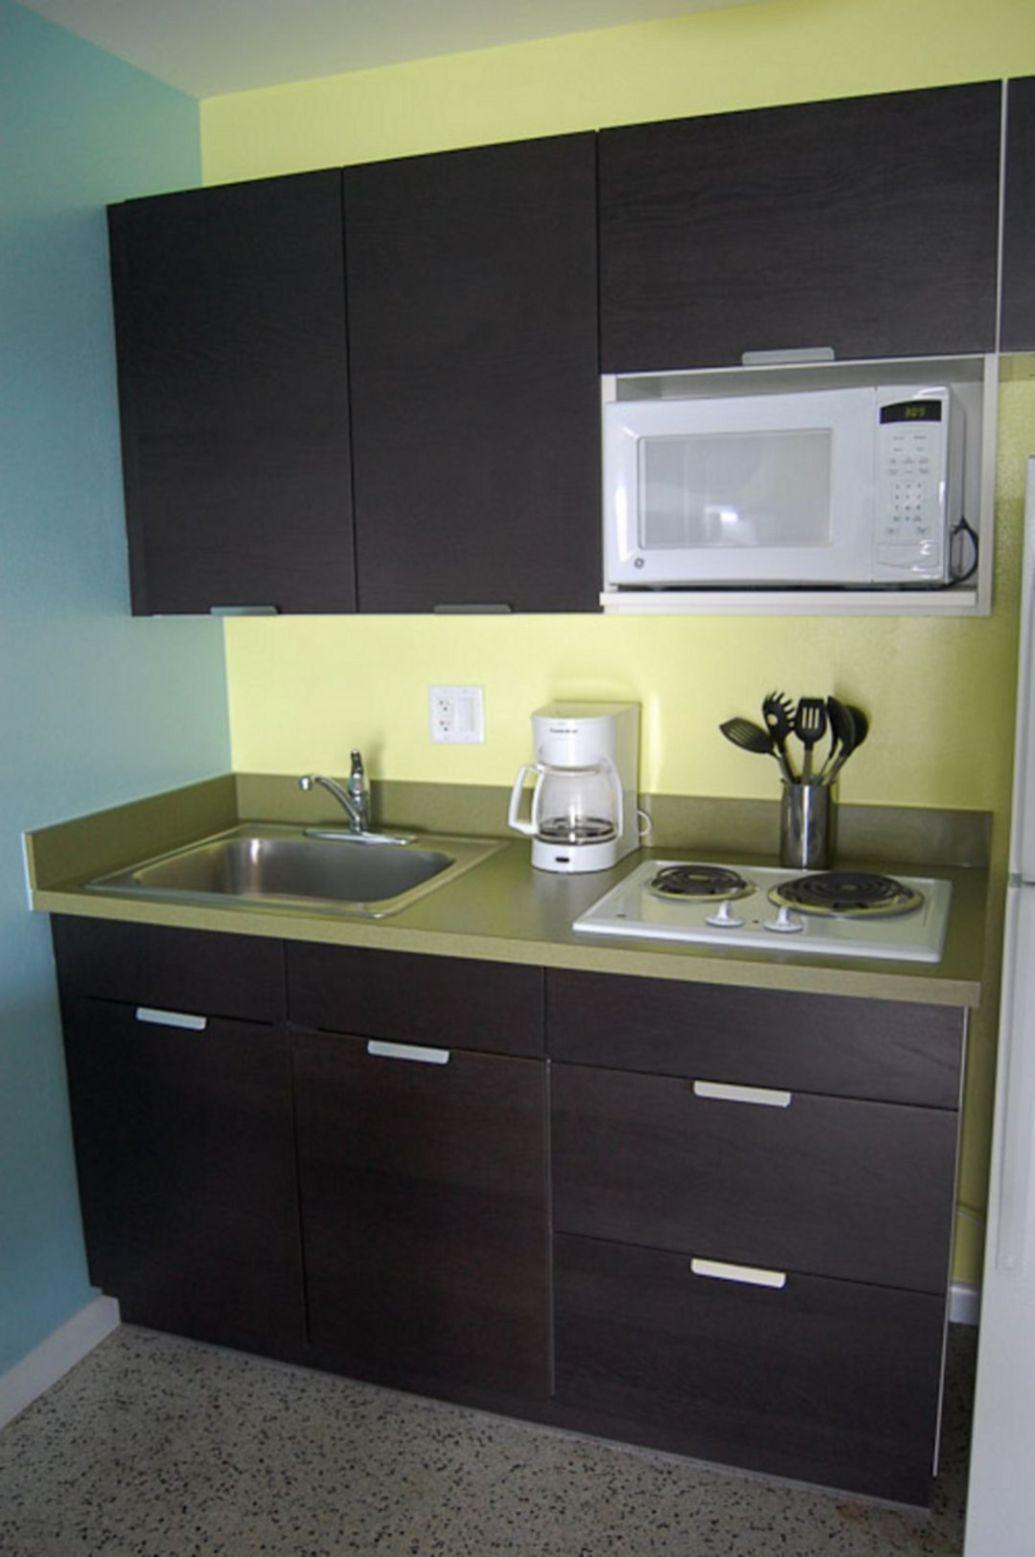 Ikea Kitchen Ideas 1018 小さなキッチン システムキッチン 収納